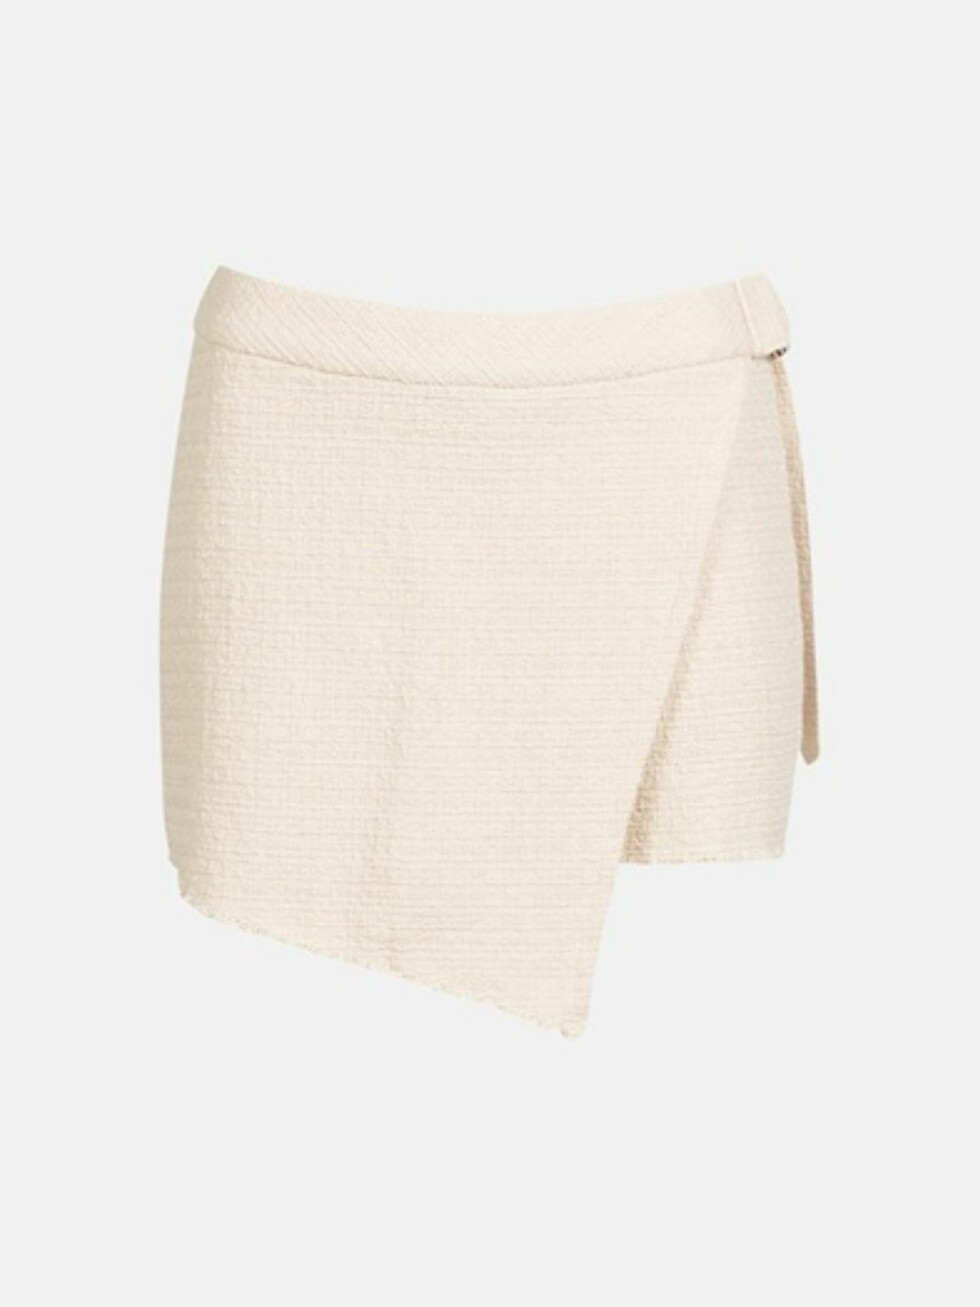 Shorts fra Never Denim, kr 499. Foto: BikBok.no